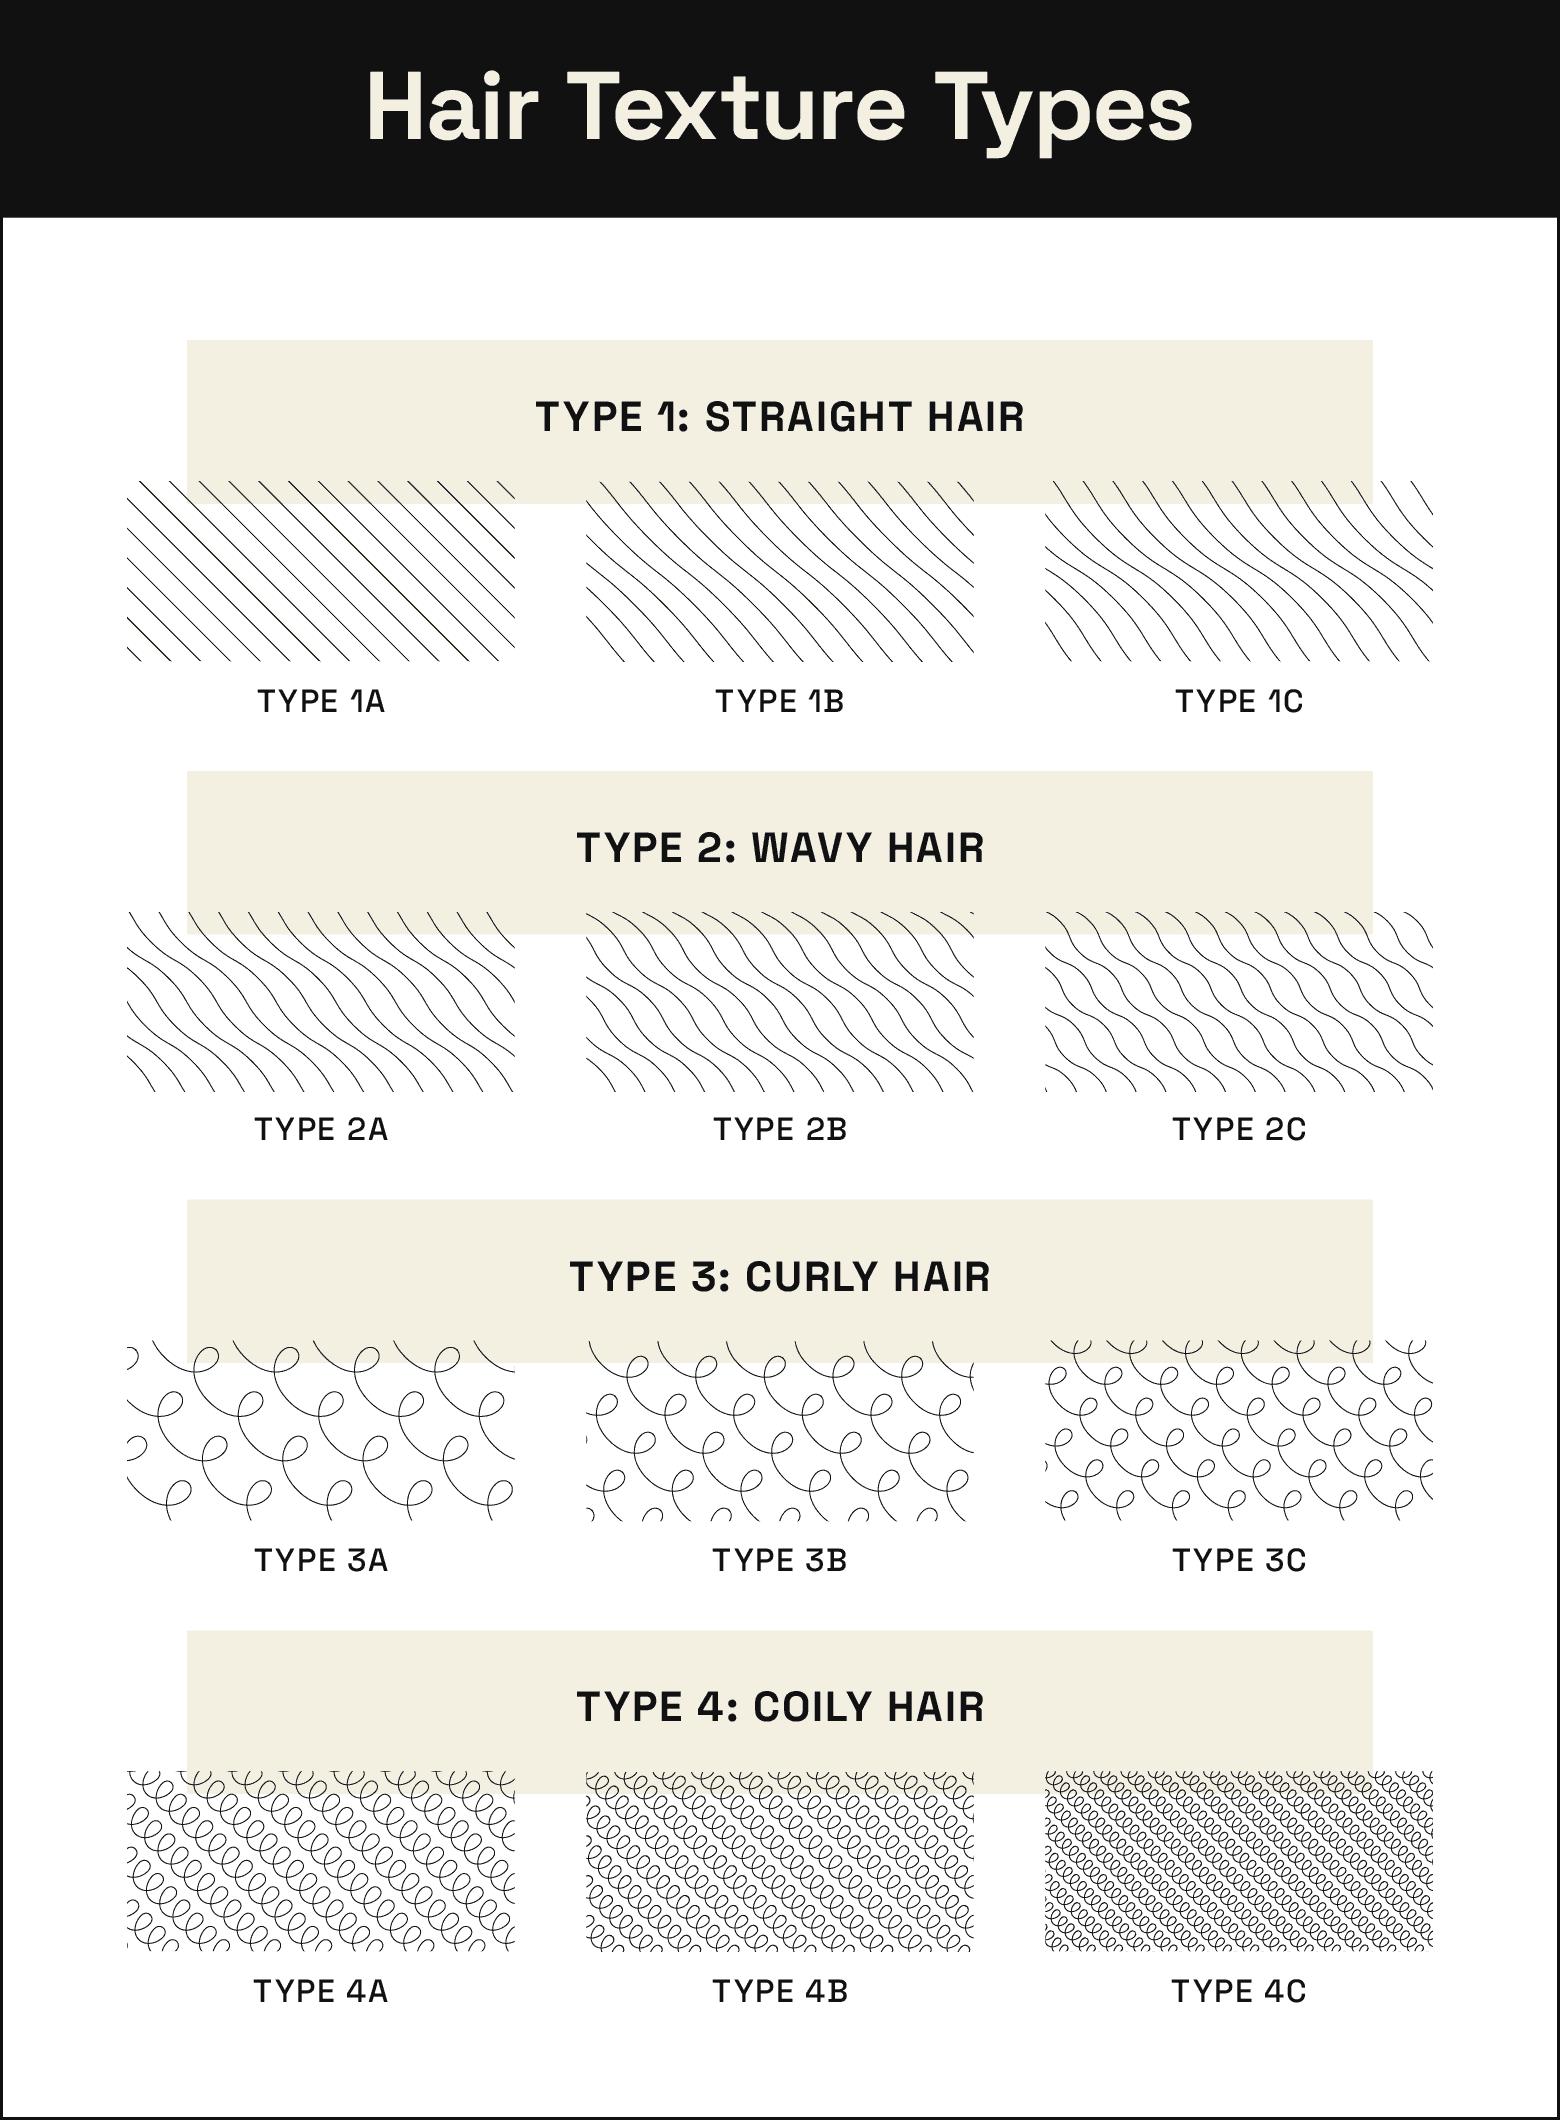 hair textures chart